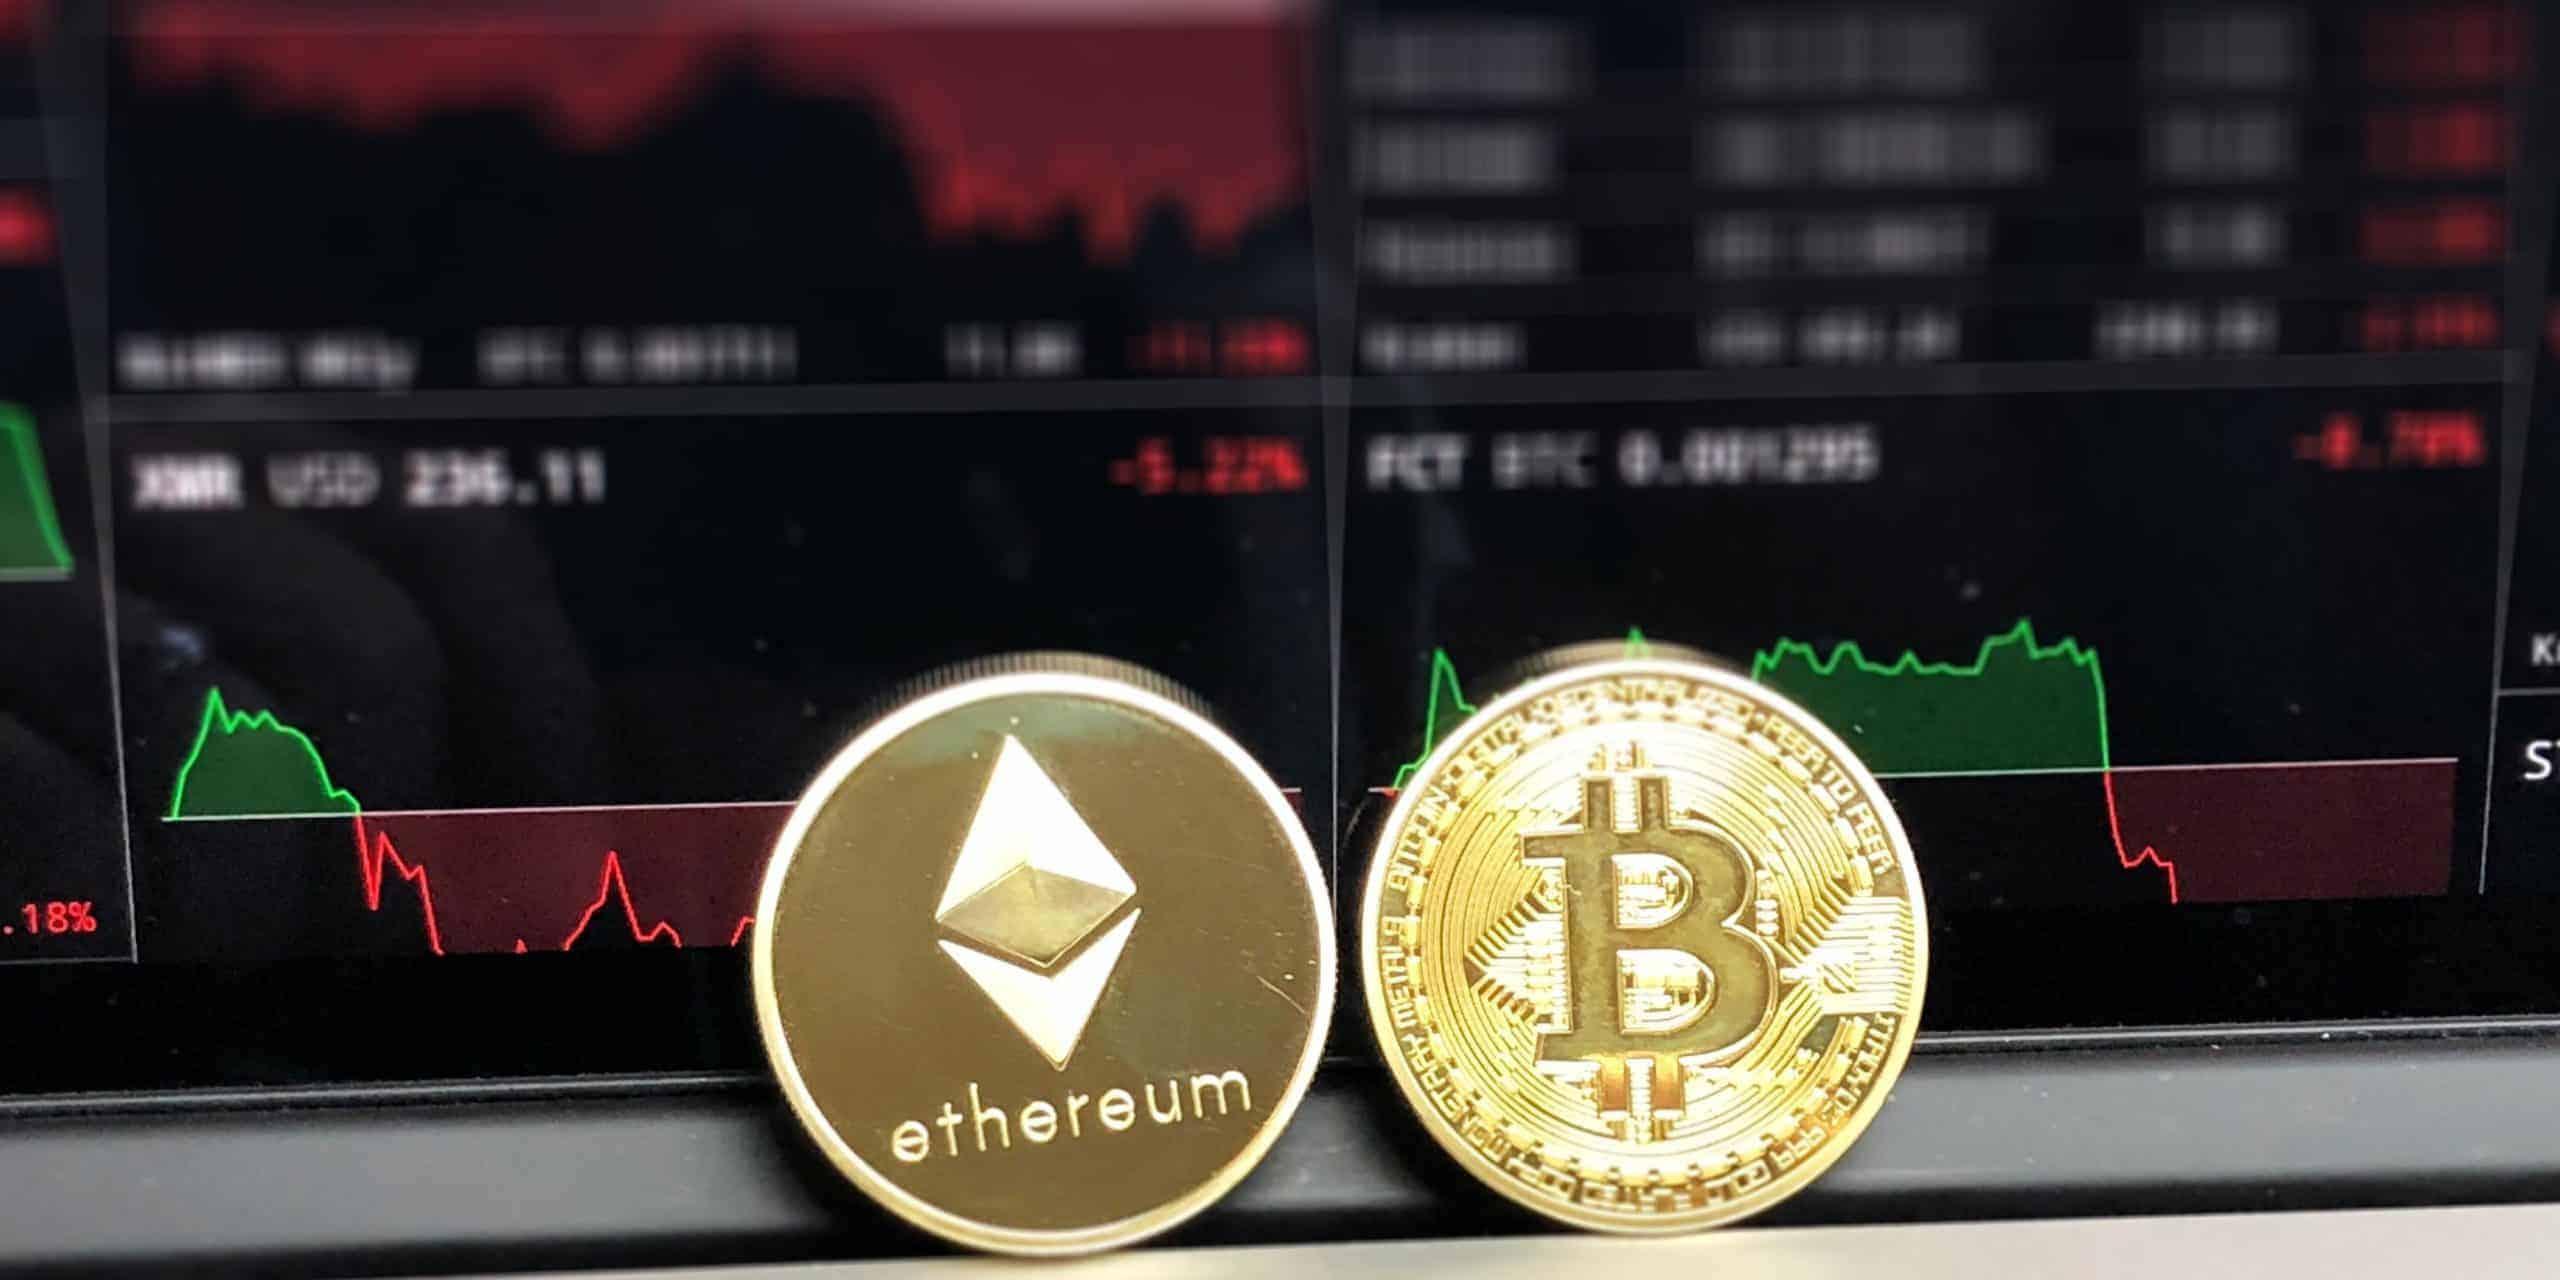 bitcoin blockchain business 730569 ConvertImage